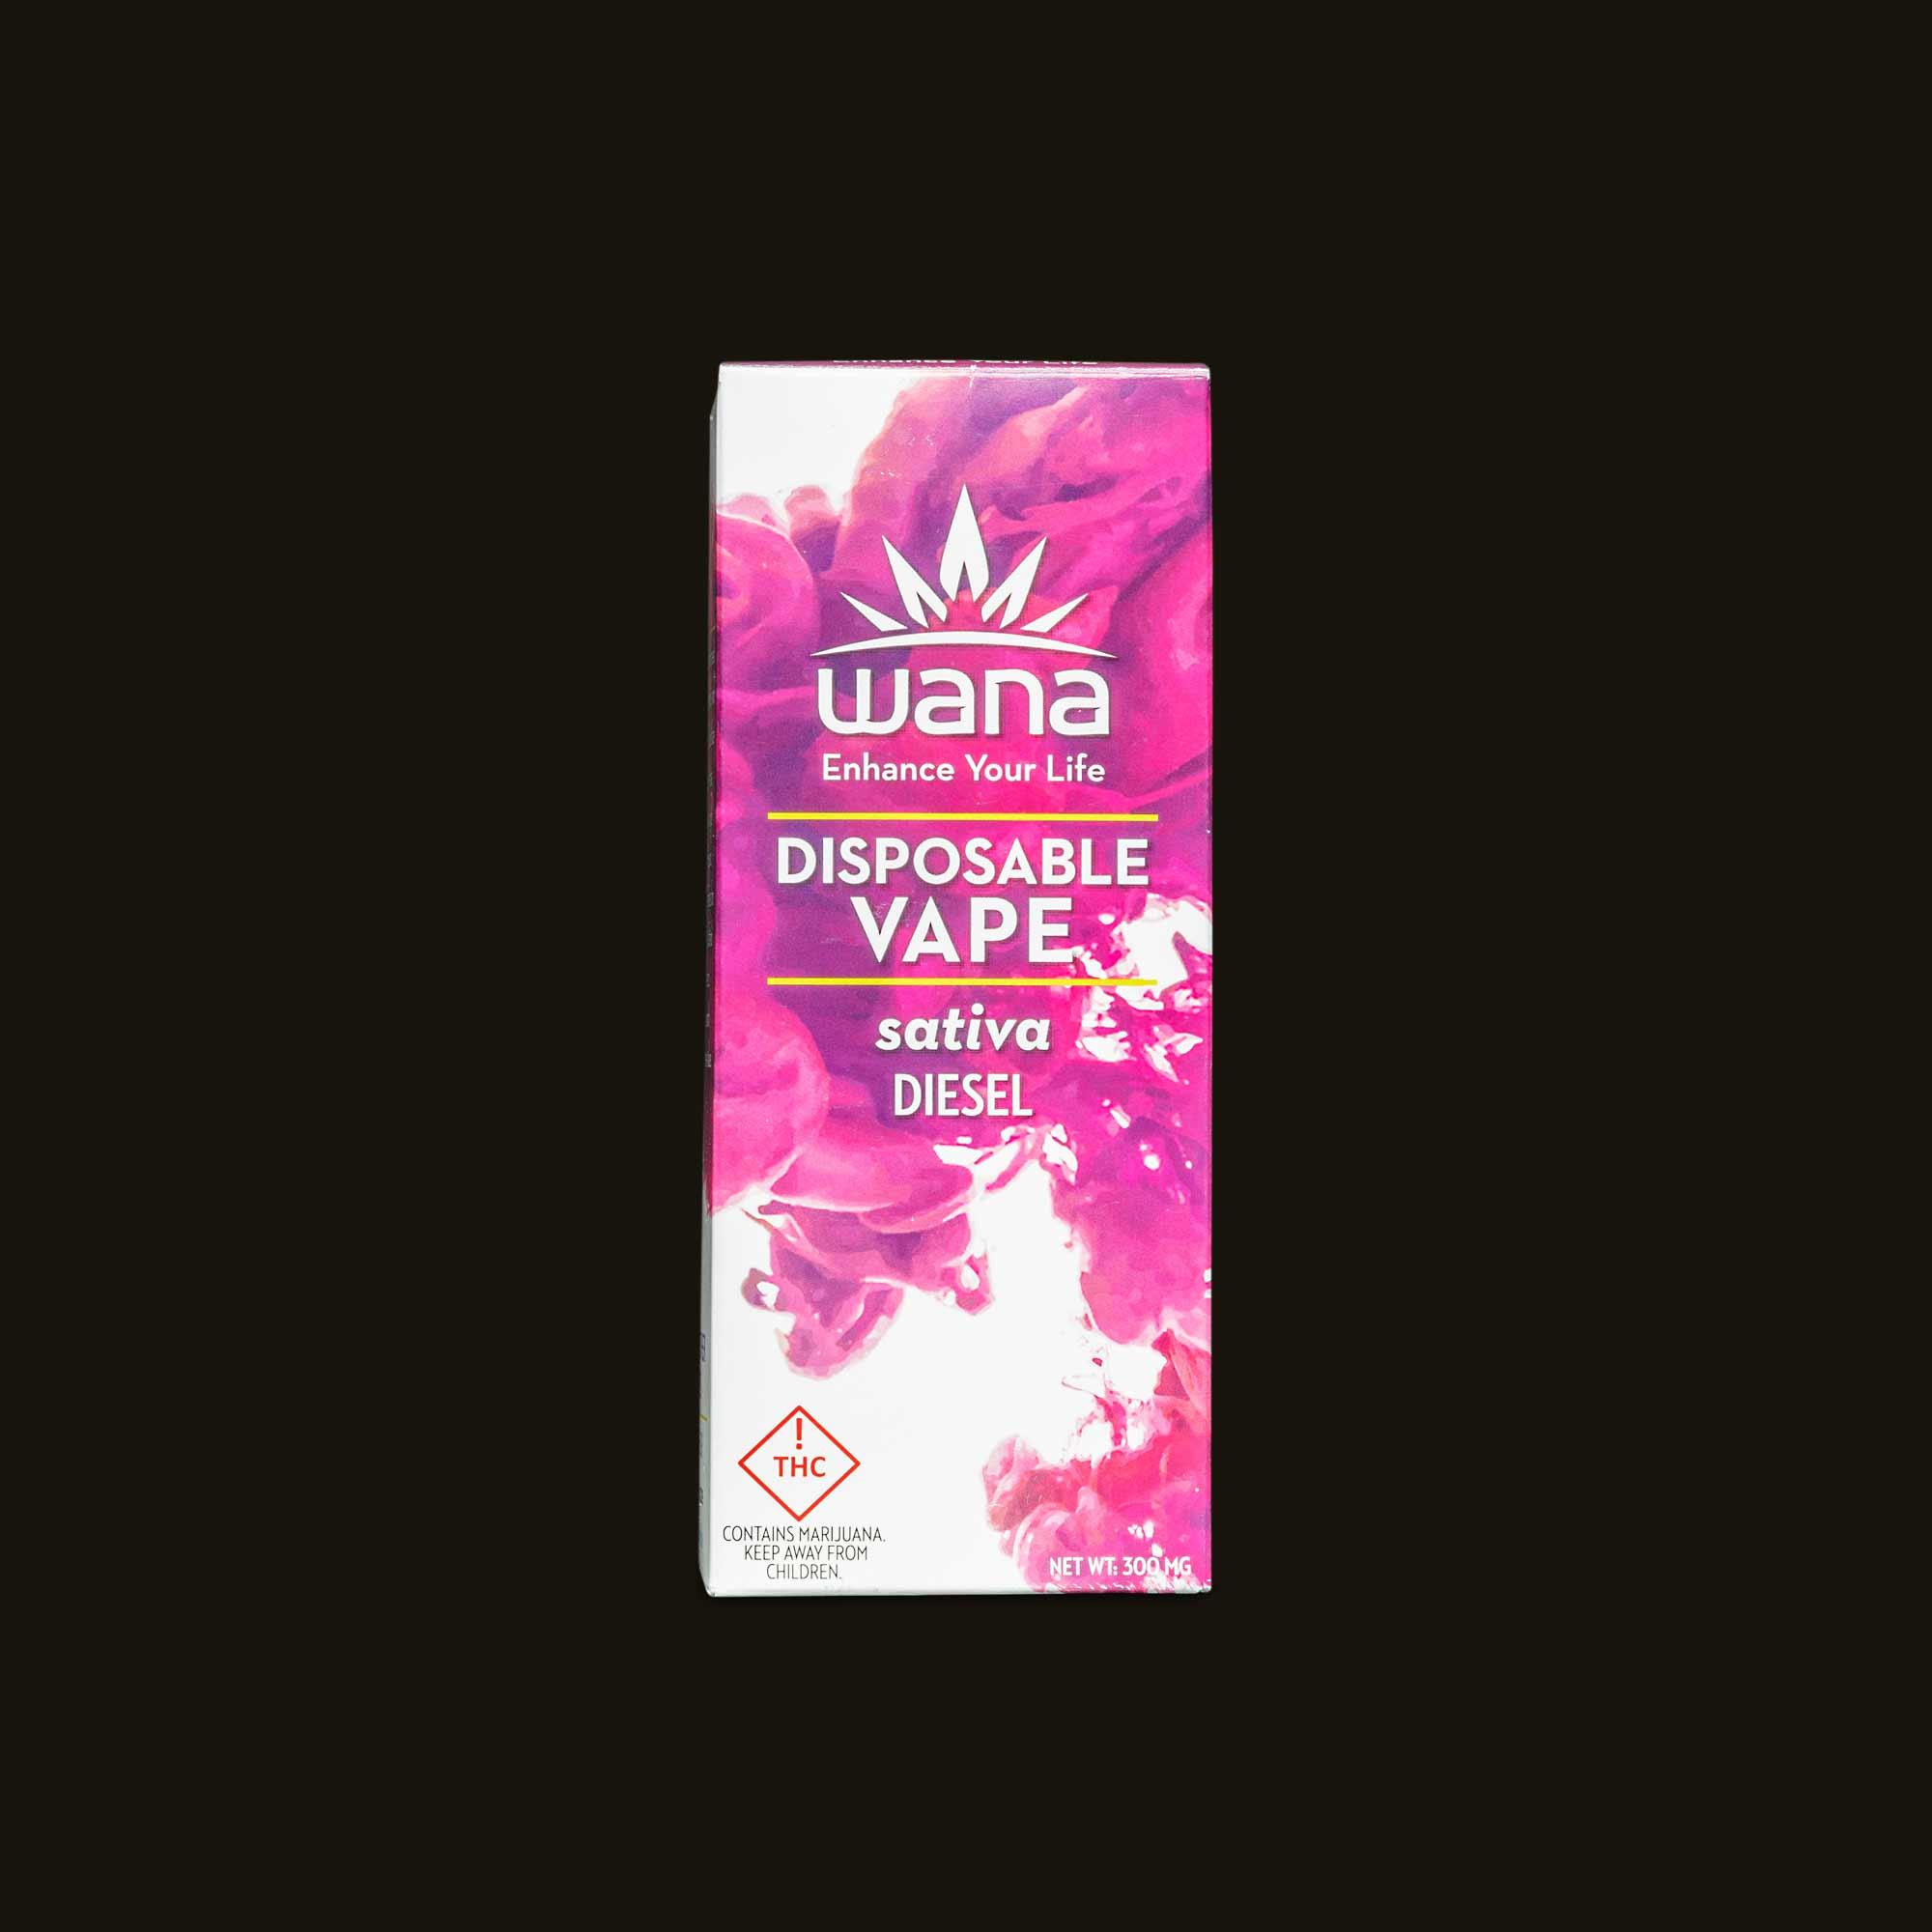 Sativa Diesel Disposable Vape  - 250mg disposable vape pen